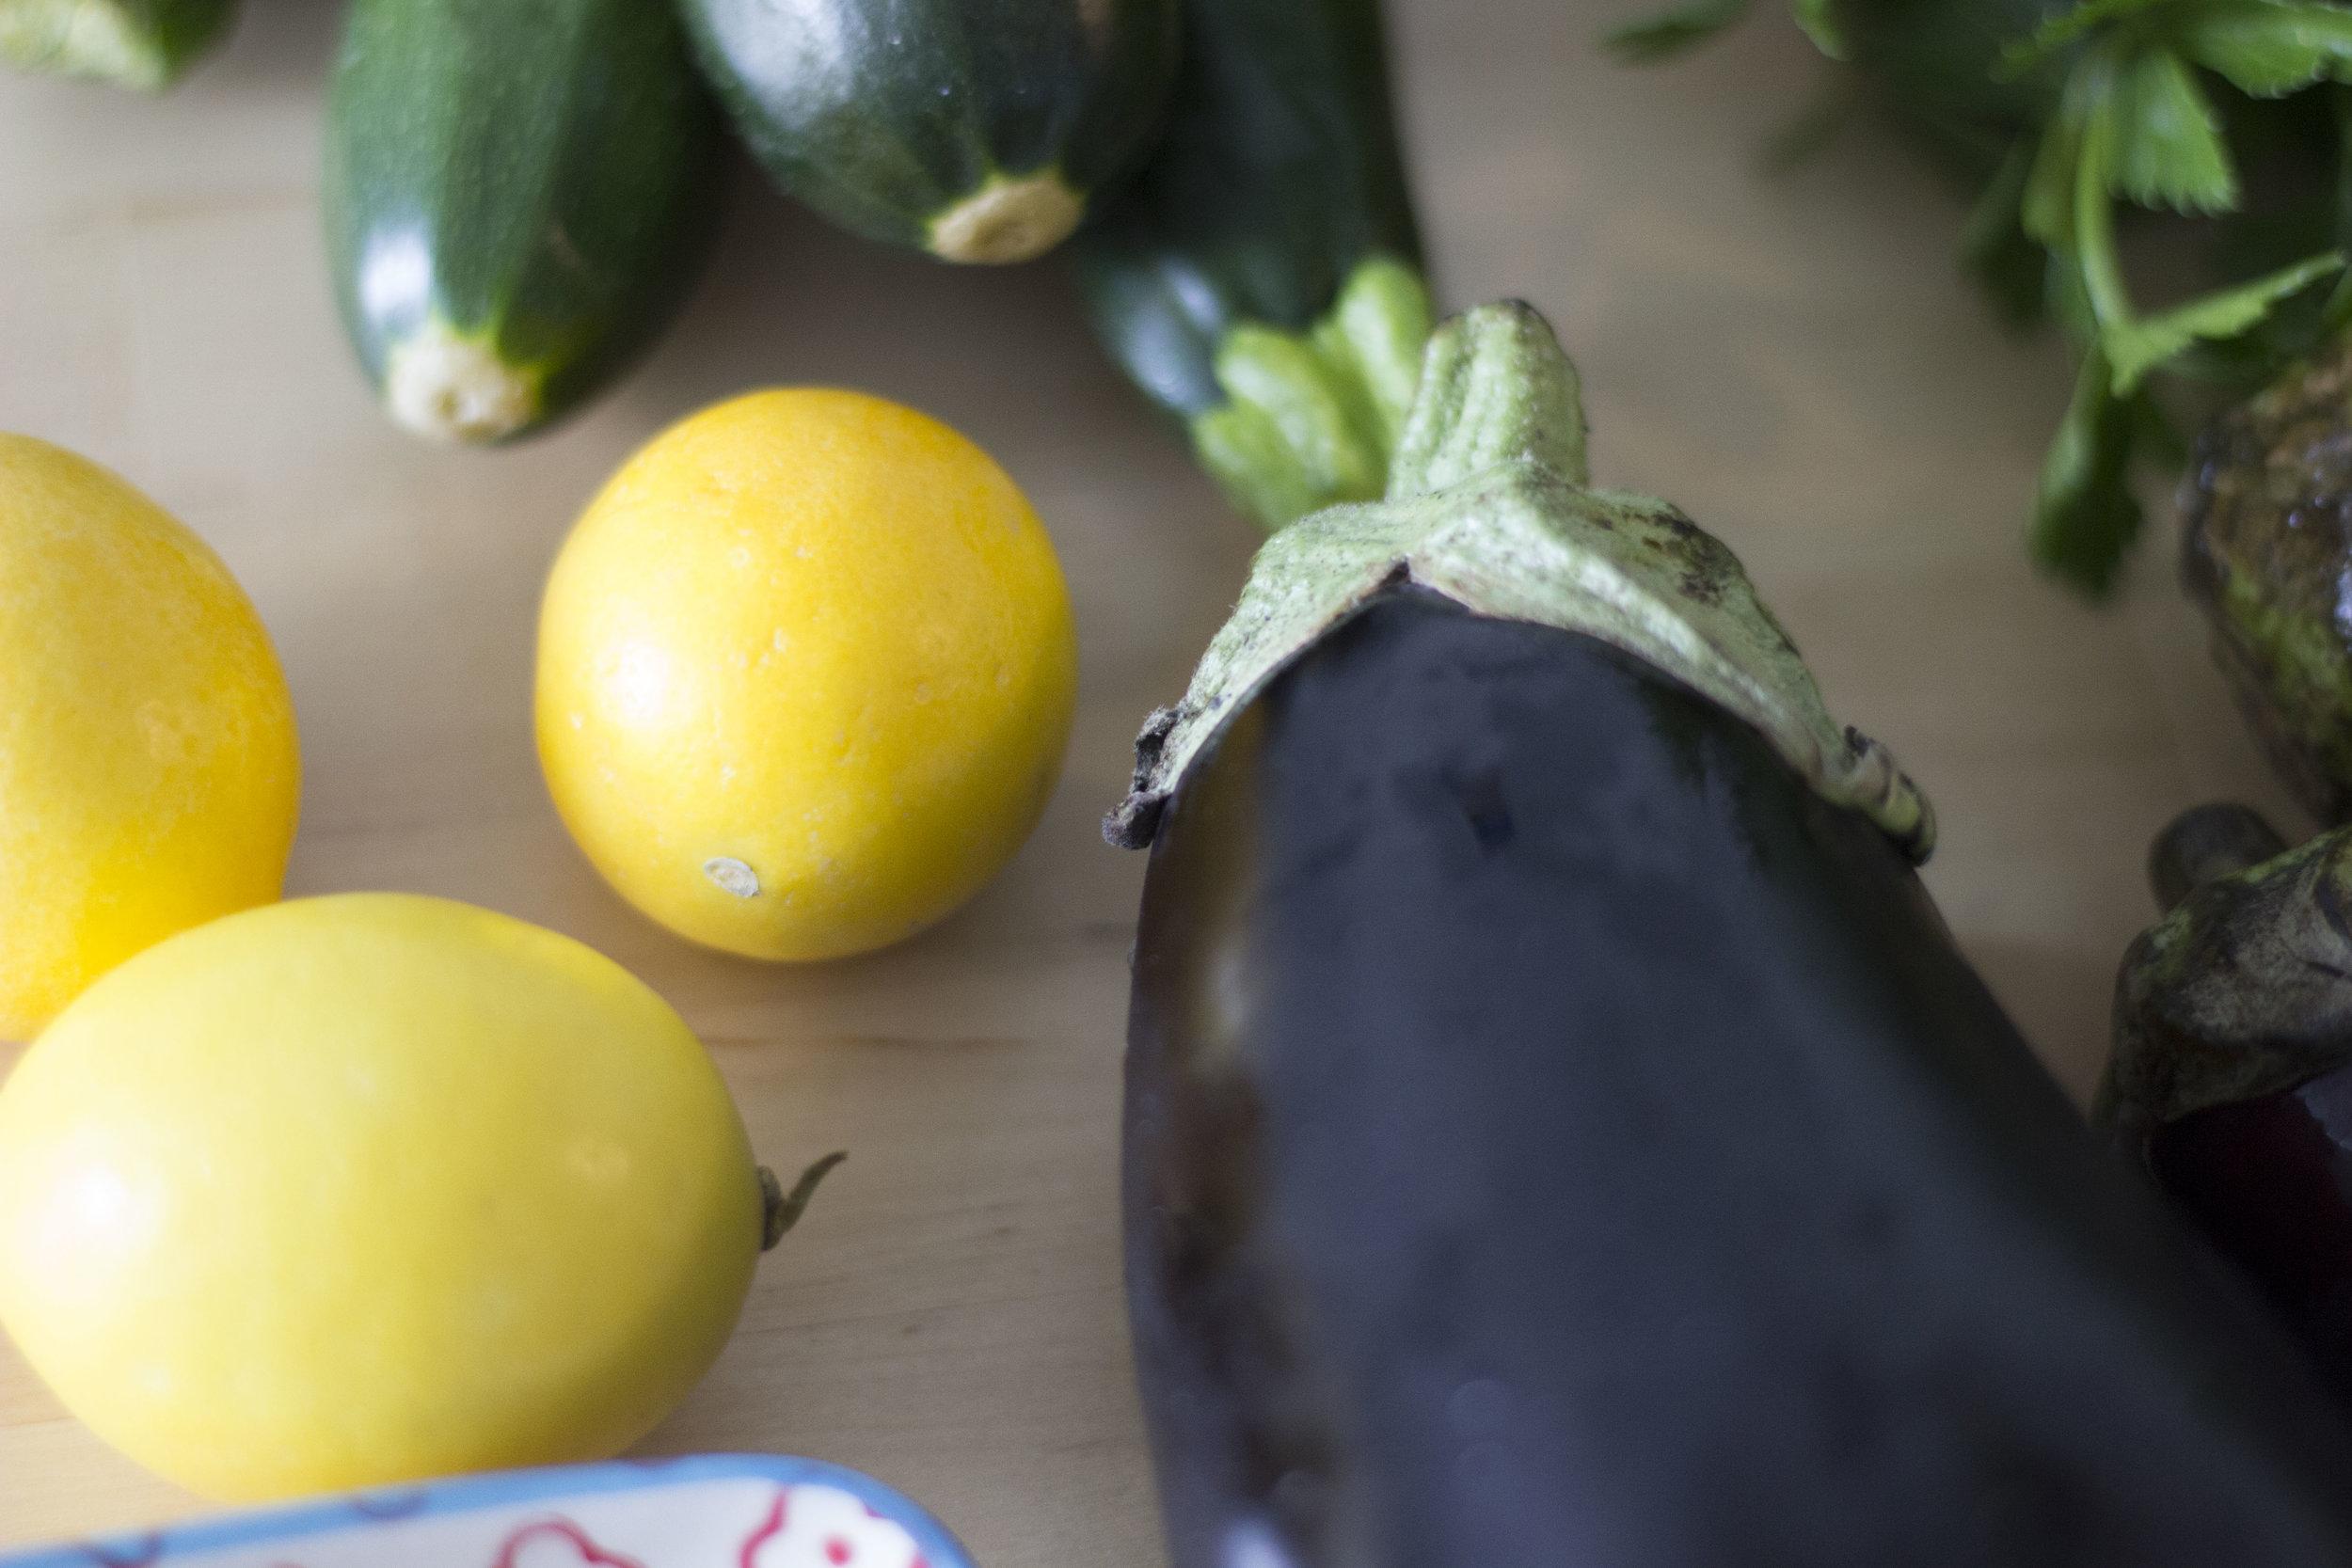 Eggplant sauce close-up eggplant lemon.jpg